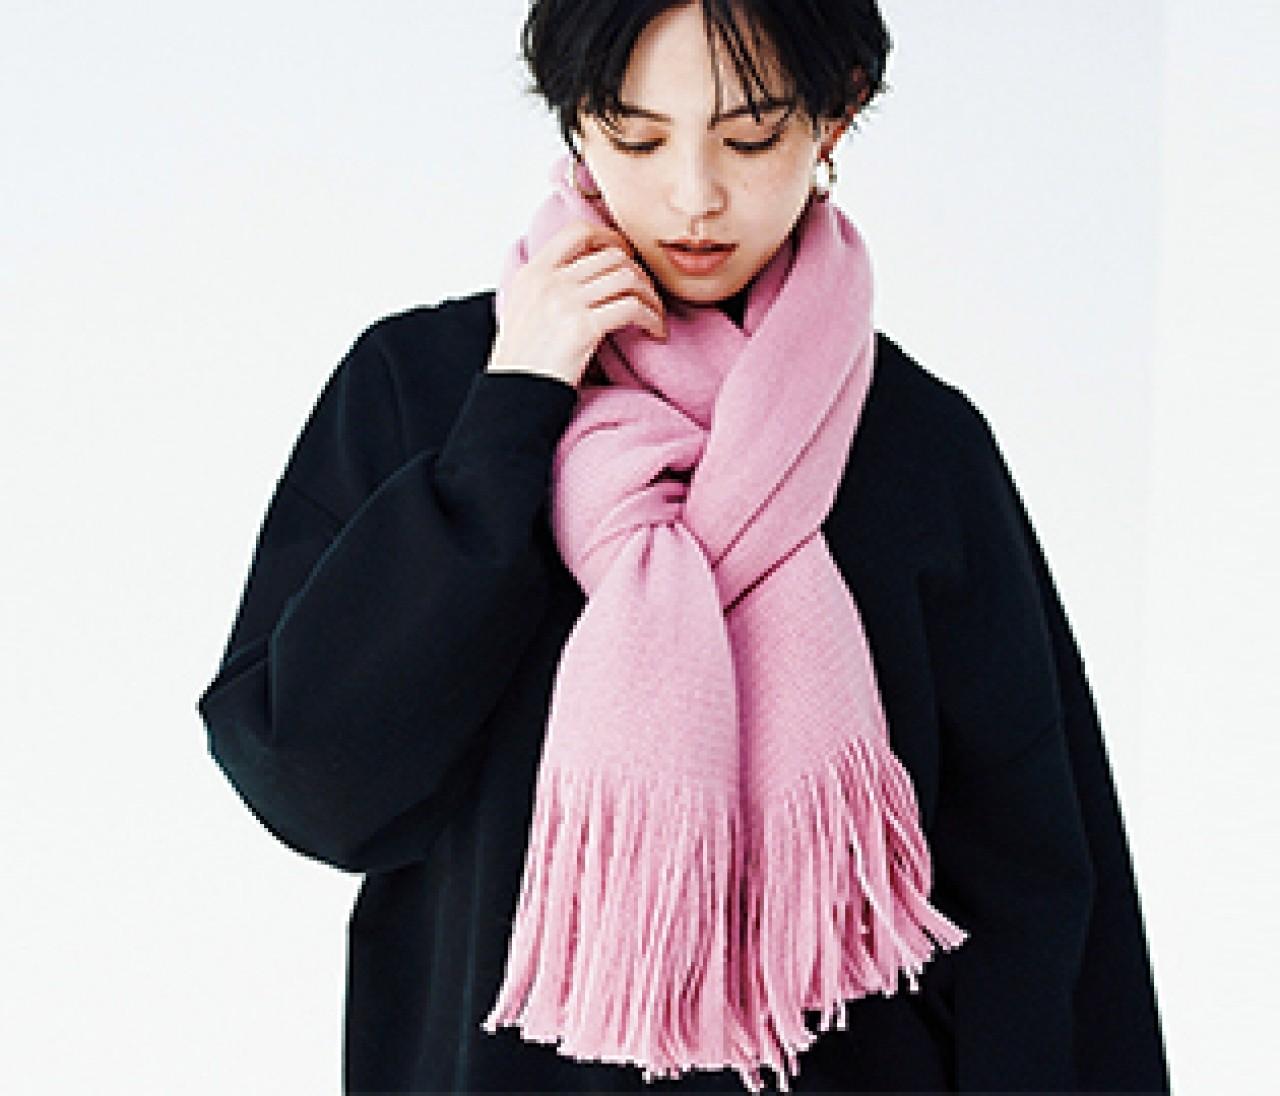 【BLACK×ピンク】プチプラ小物で大人の可愛げをリマインド♡